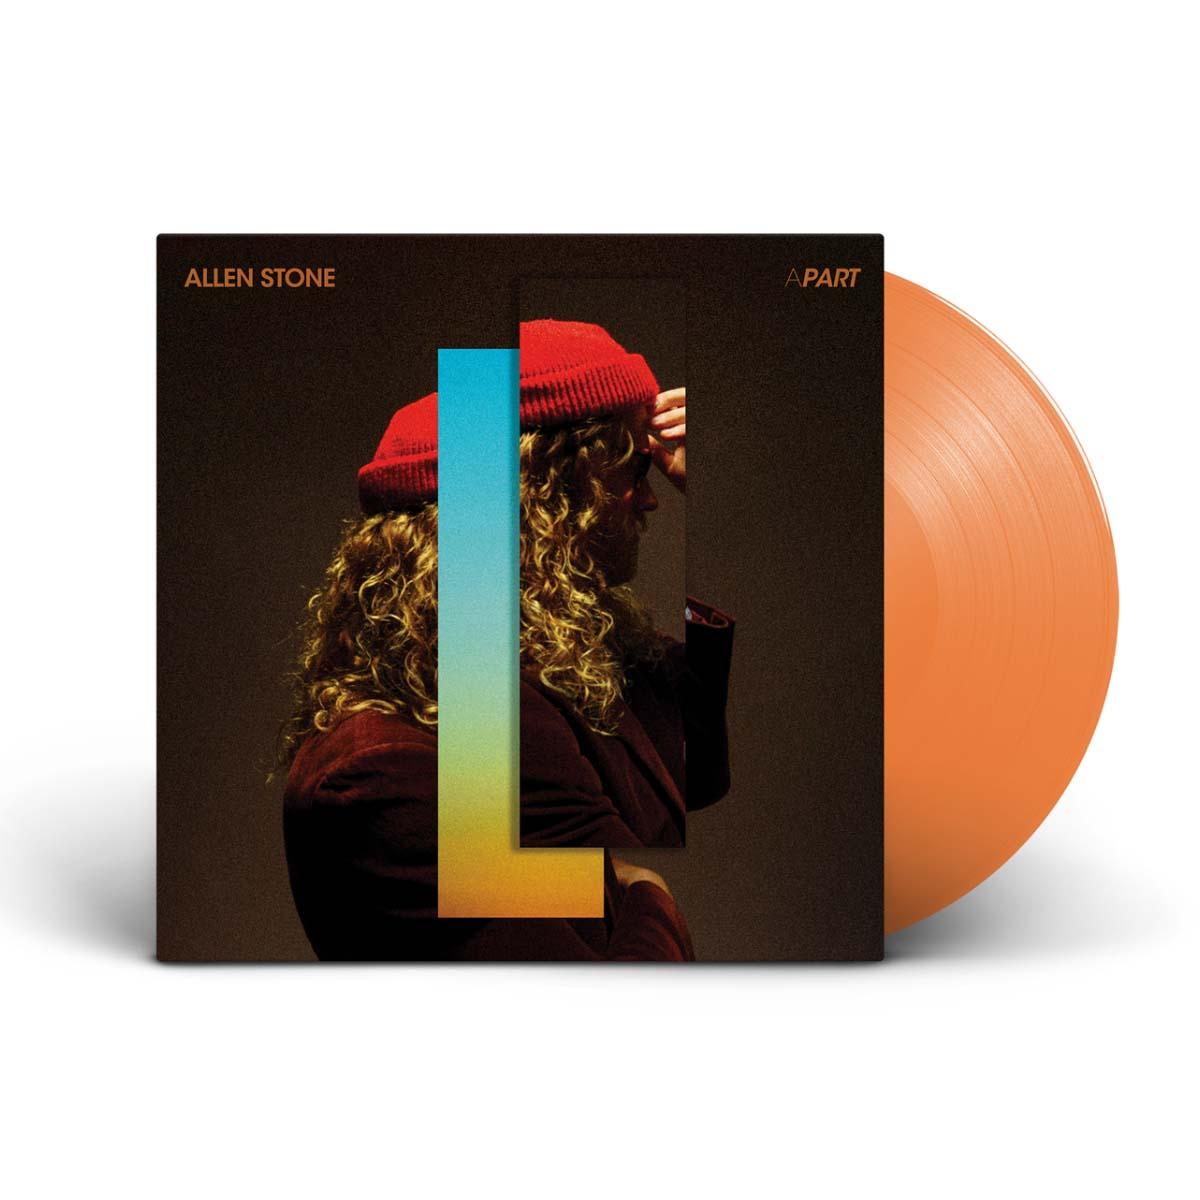 Allen Stone – APART on Translucent Orange Vinyl